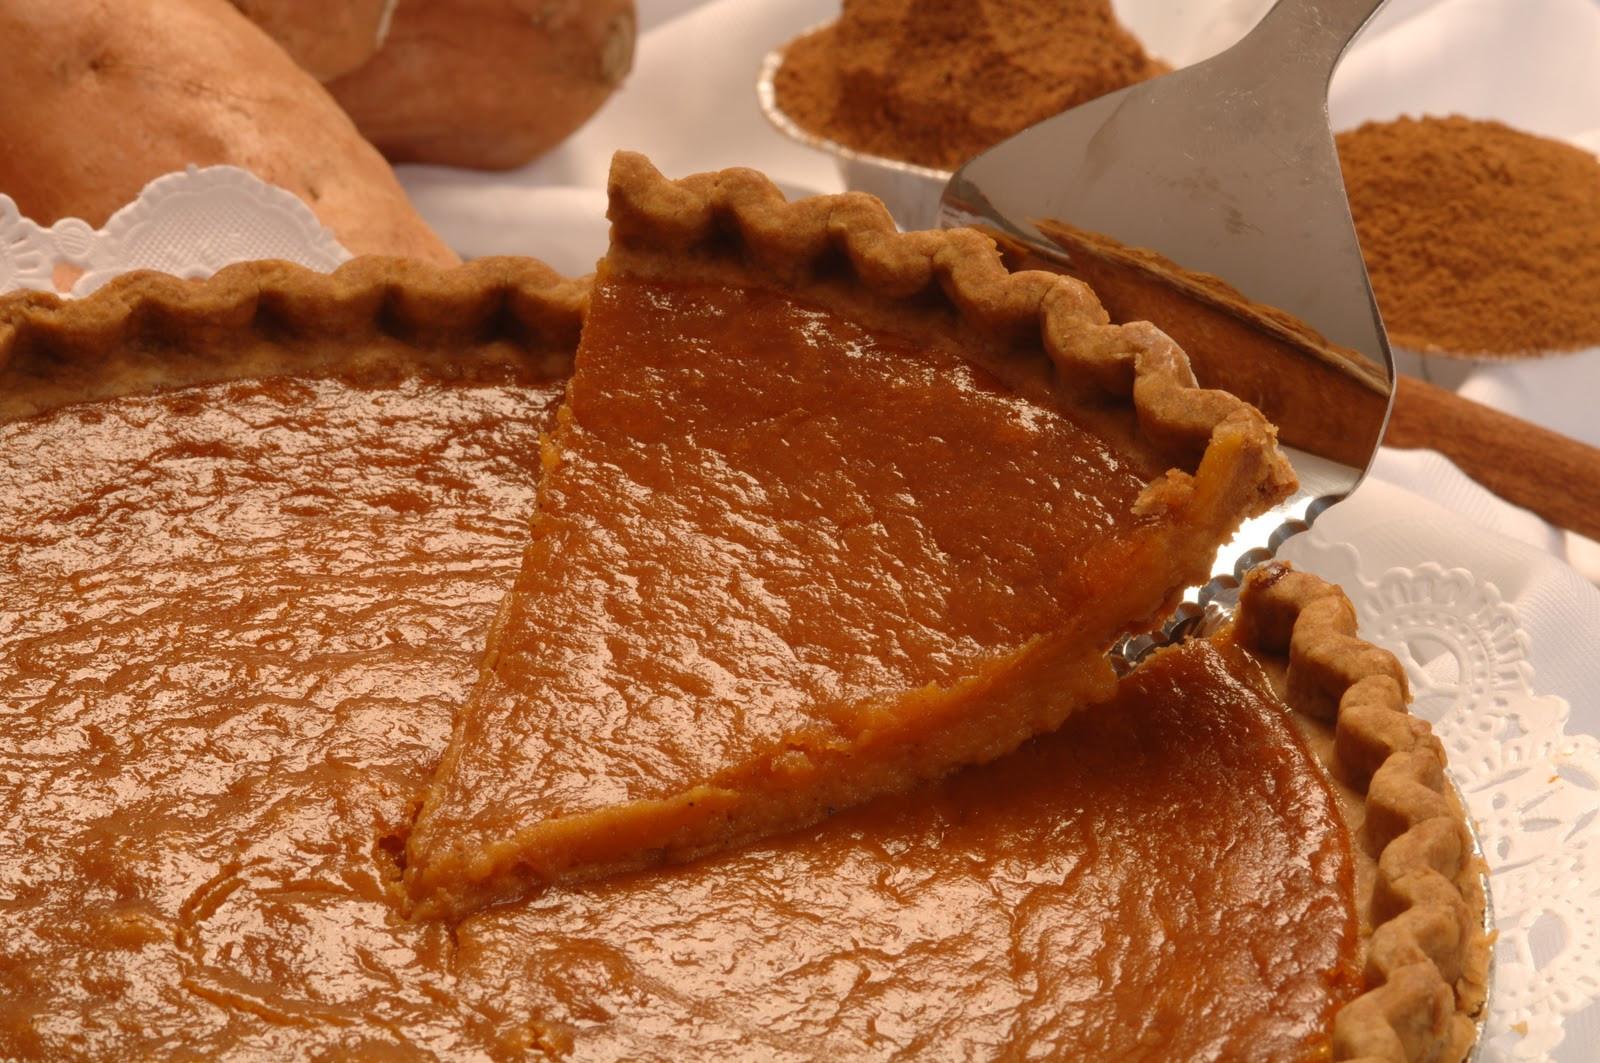 Best Sweet Potato Pie Recipe  The Thrillbilly Gourmet Sweet Potato Pie Southern Classic